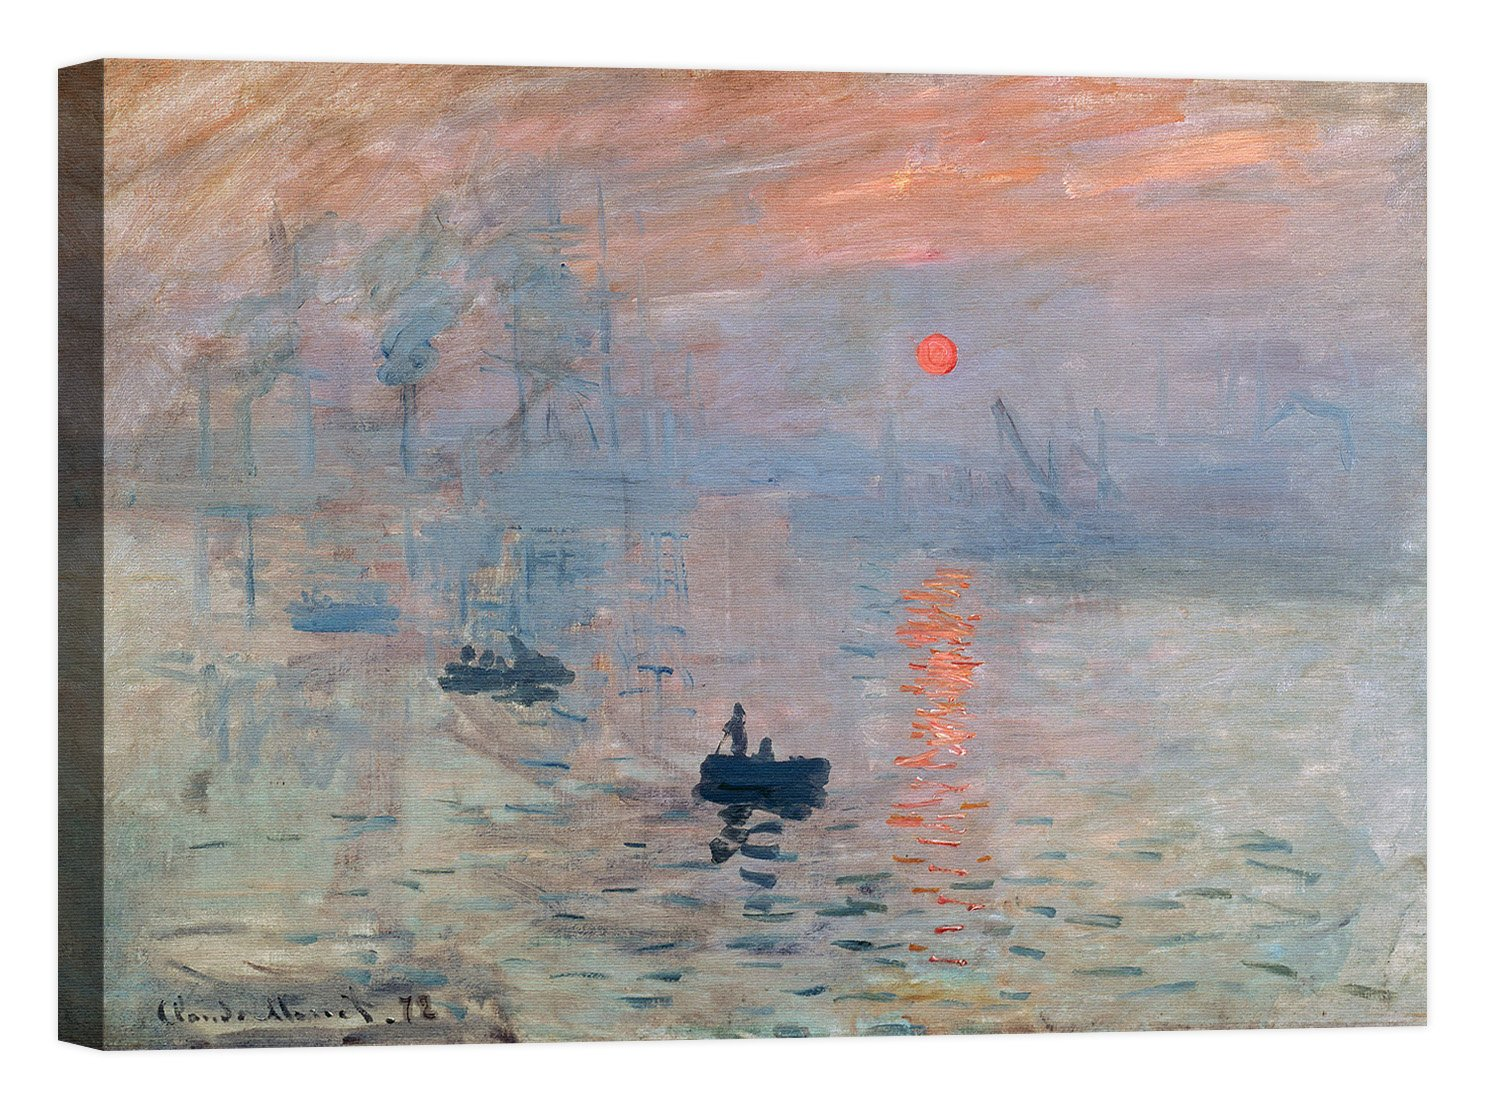 LuxHomeDecor Rahmen Druck auf Leinwand mit Rahmen in Holz Claude Monet Impression Au Soleil Levant 100x75 CM